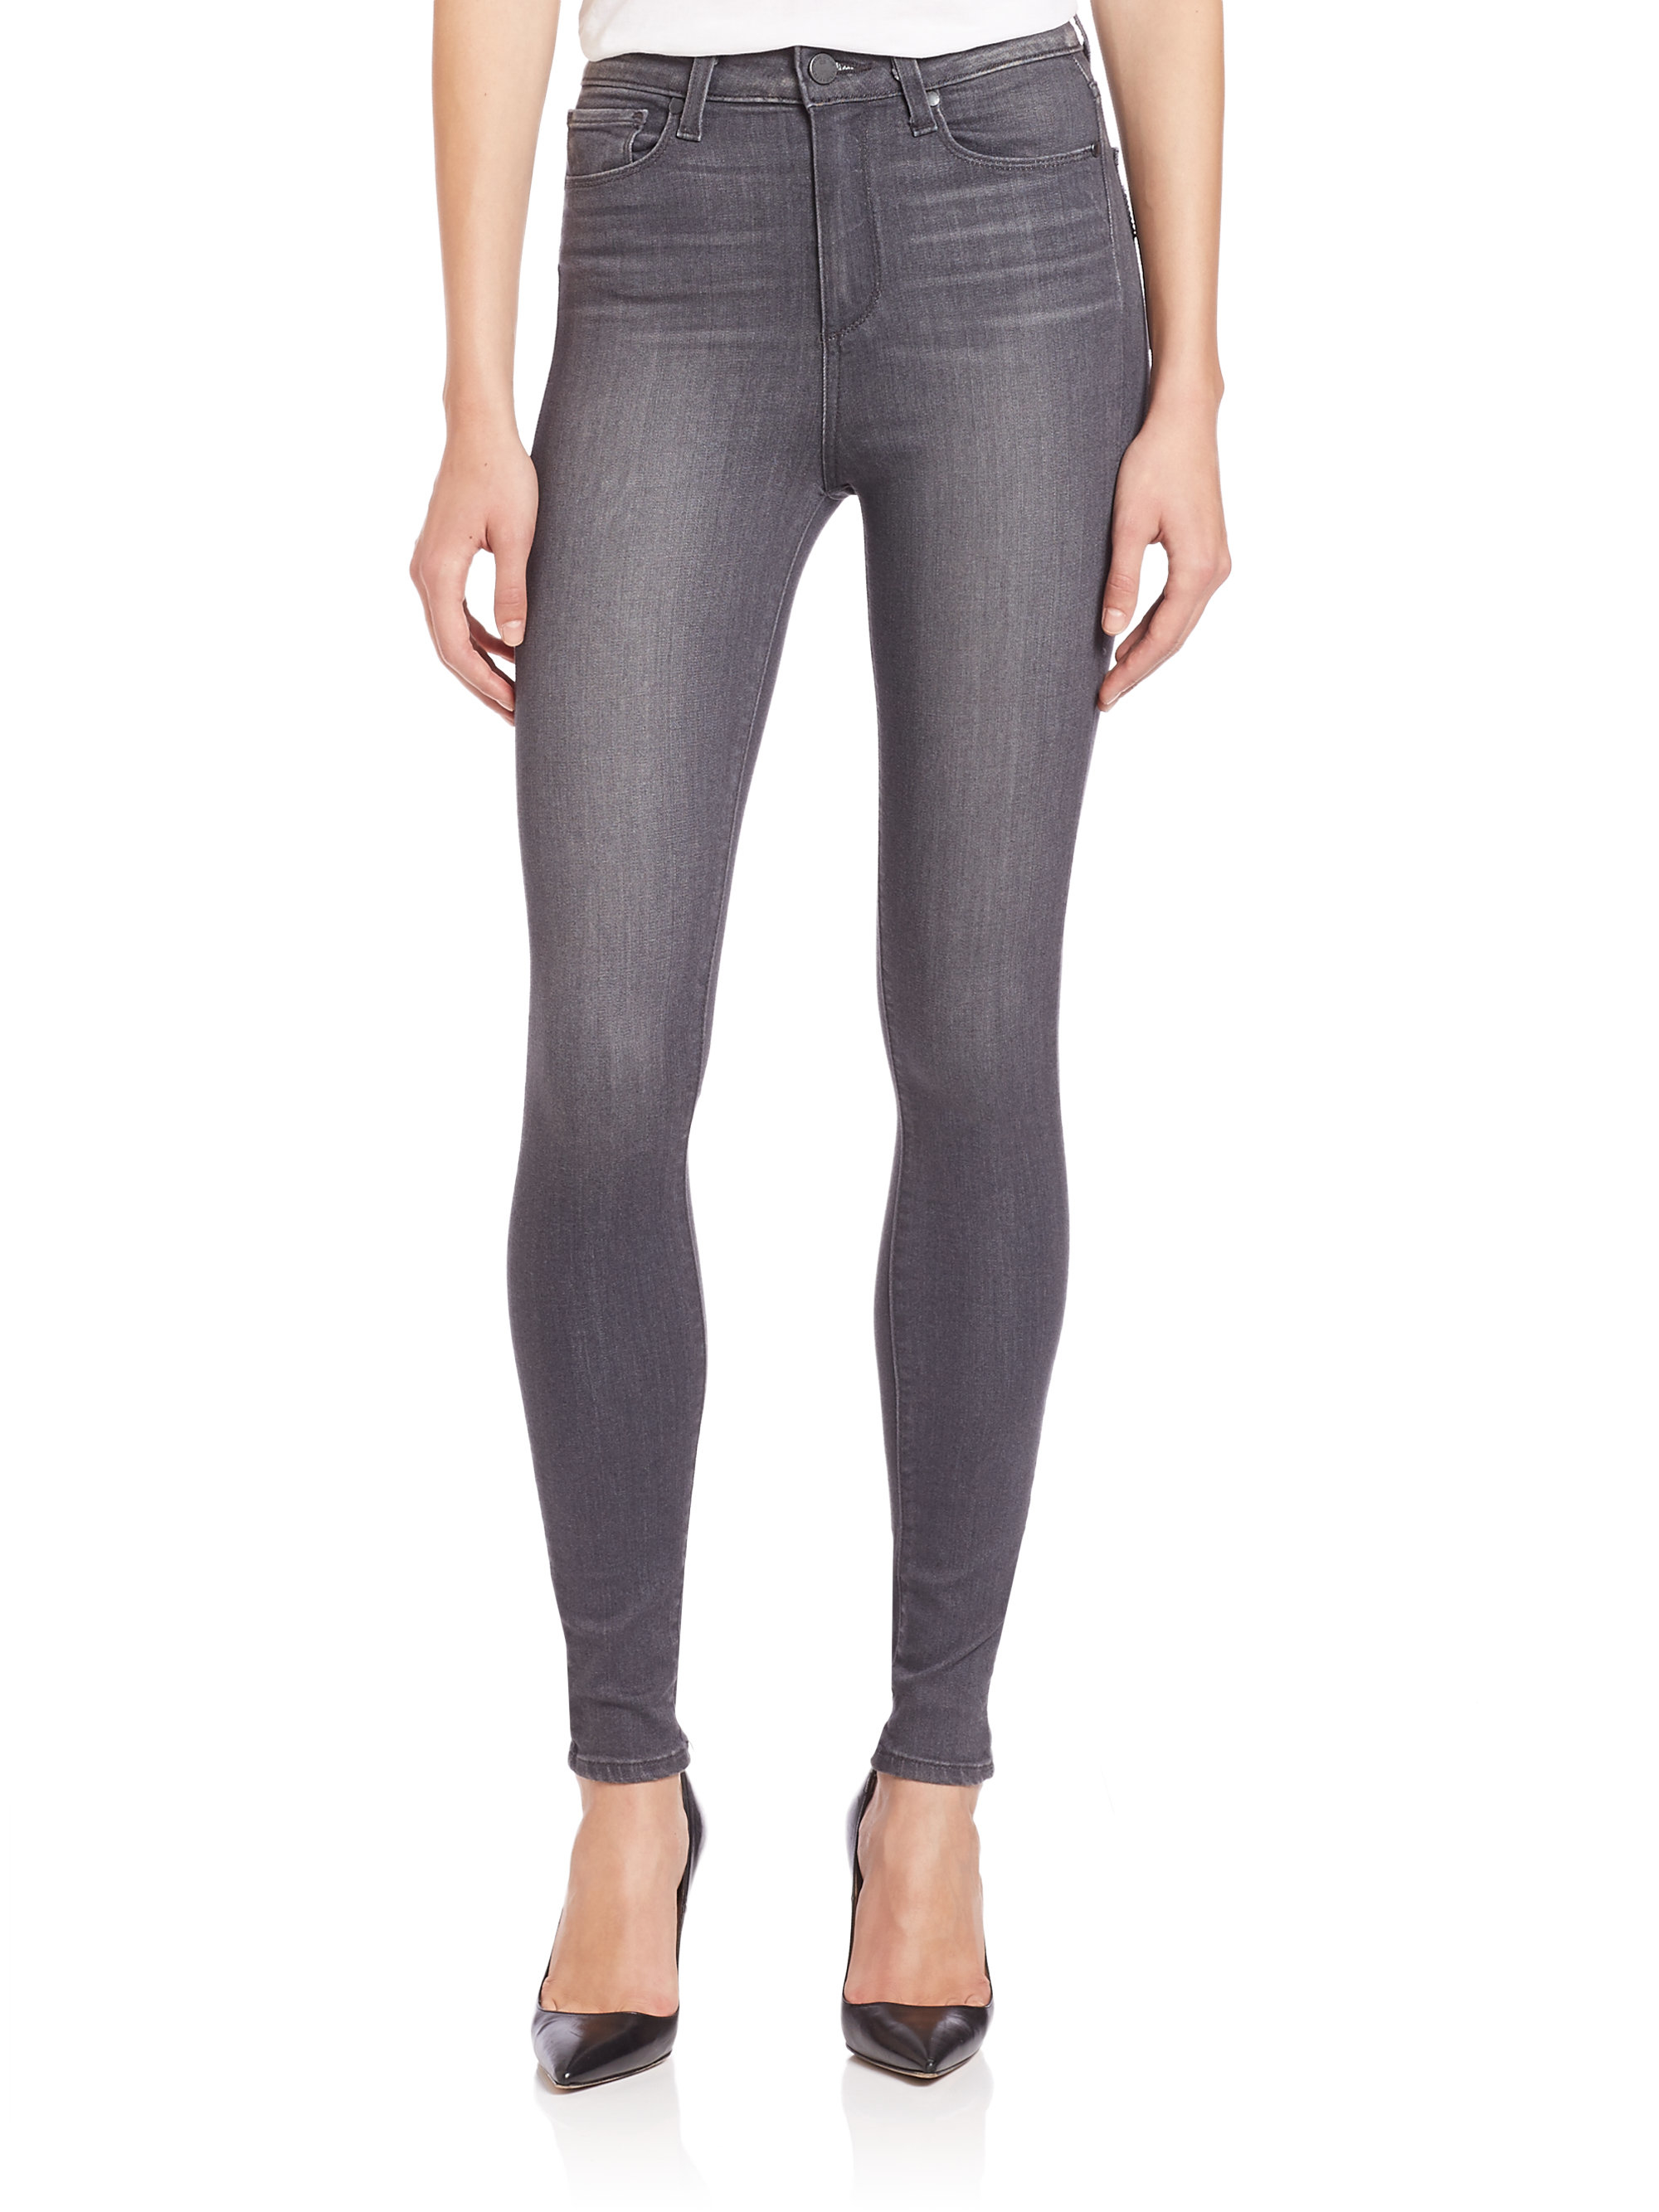 Paige high waisted jeans – Global fashion jeans models